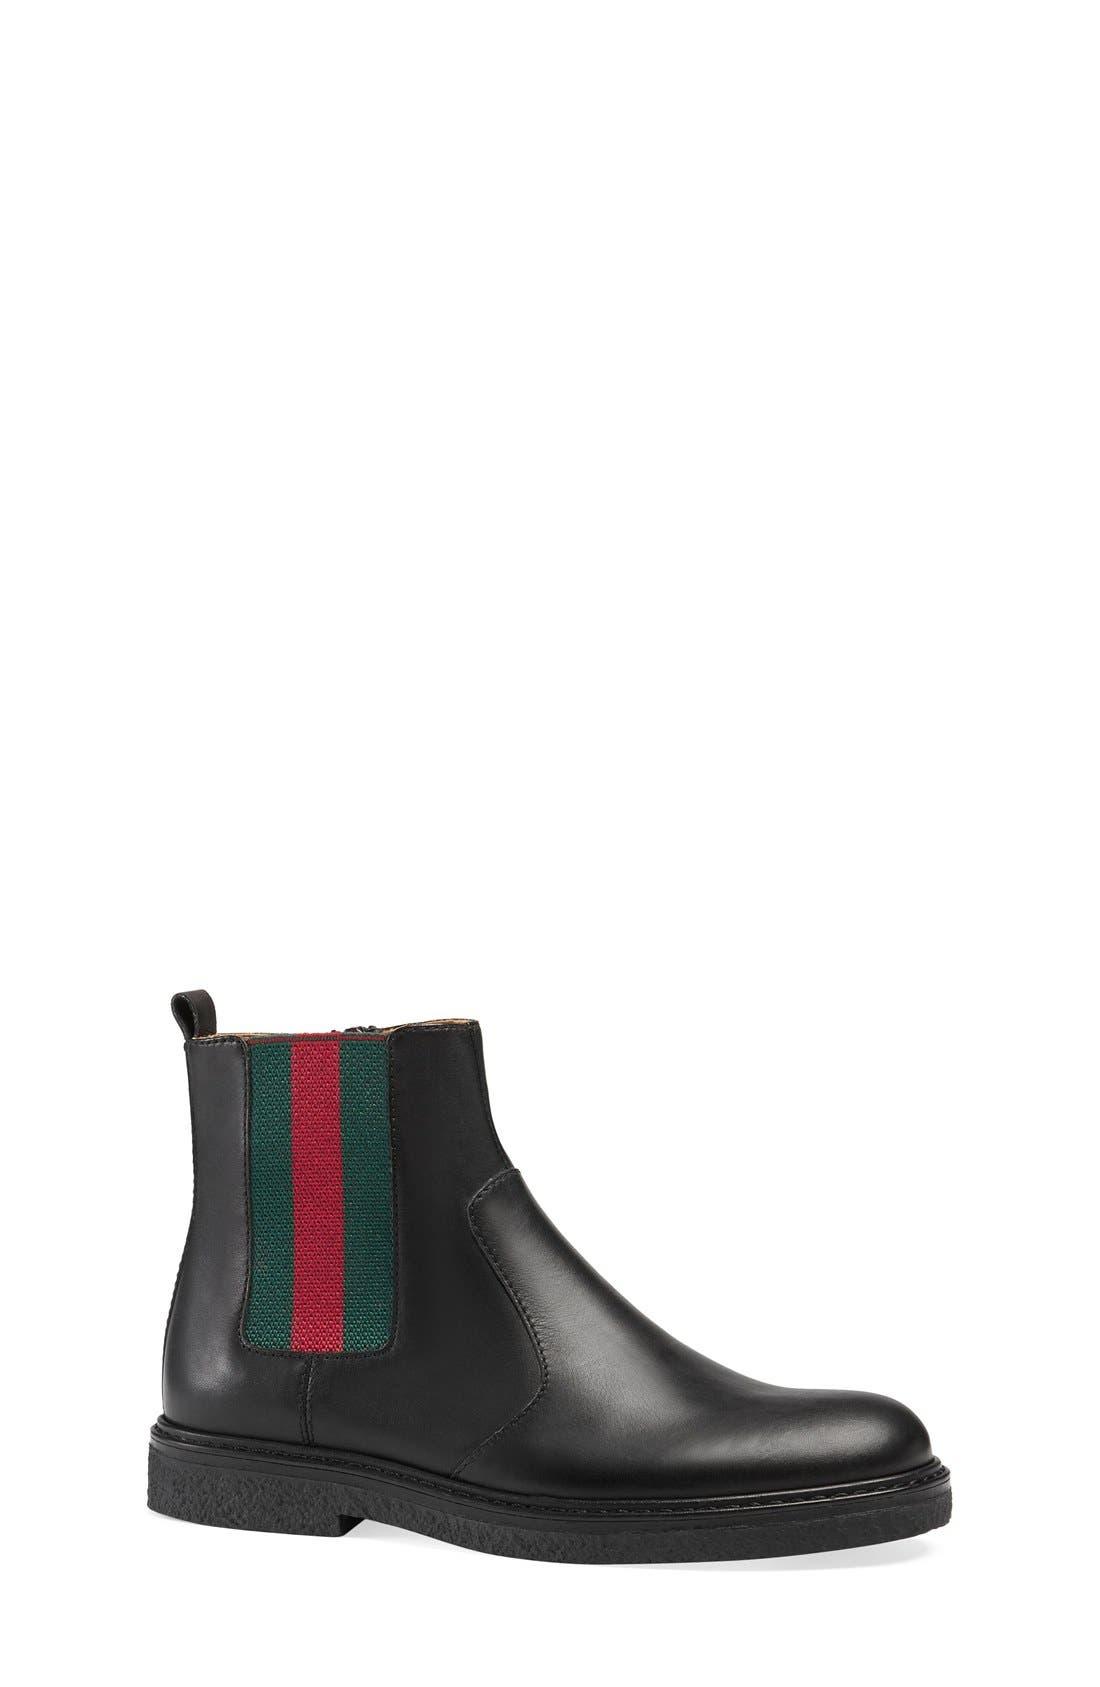 'Joshua' Chelsea Boot,                             Alternate thumbnail 2, color,                             Black